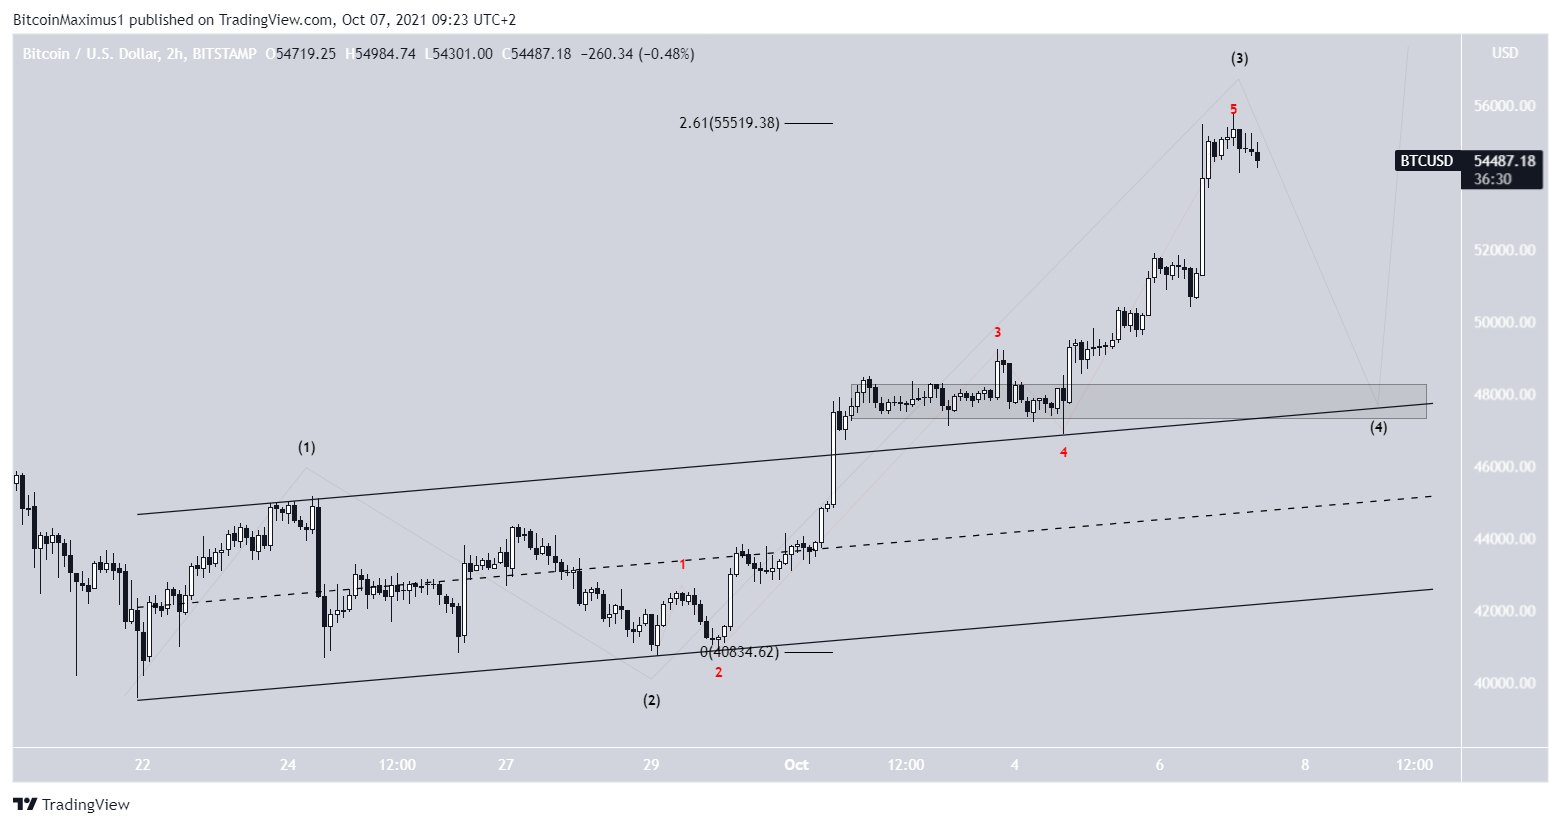 BTC short-term movement